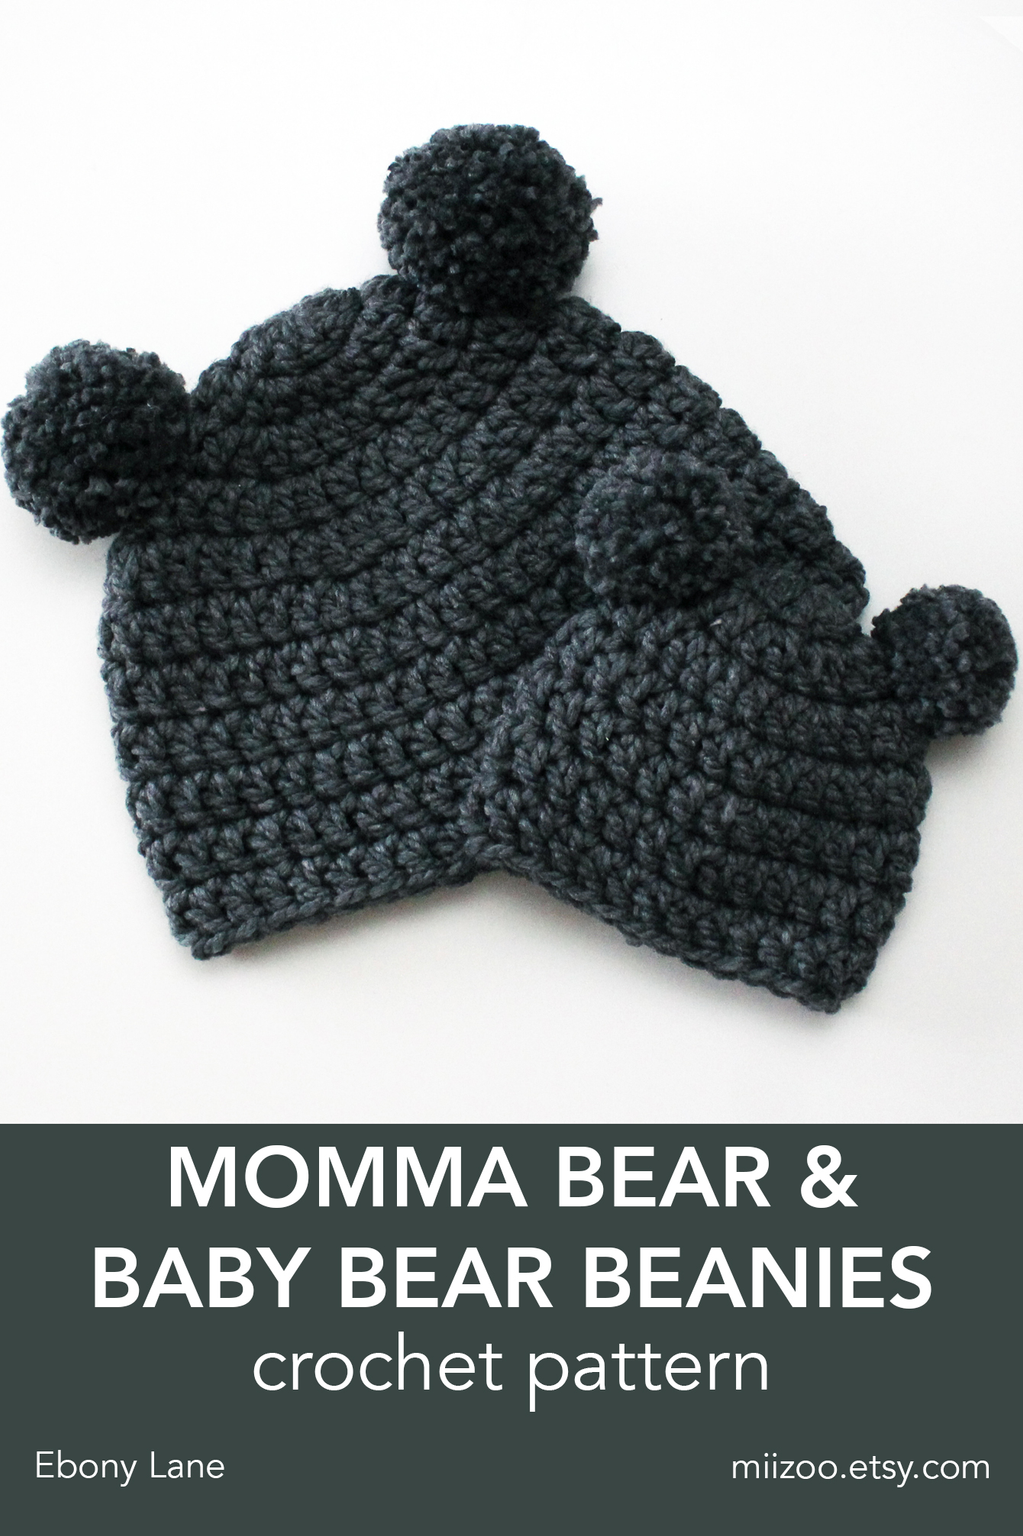 ee361e5d3d0 Momma Bear   Baby Bear Beanie Pattern